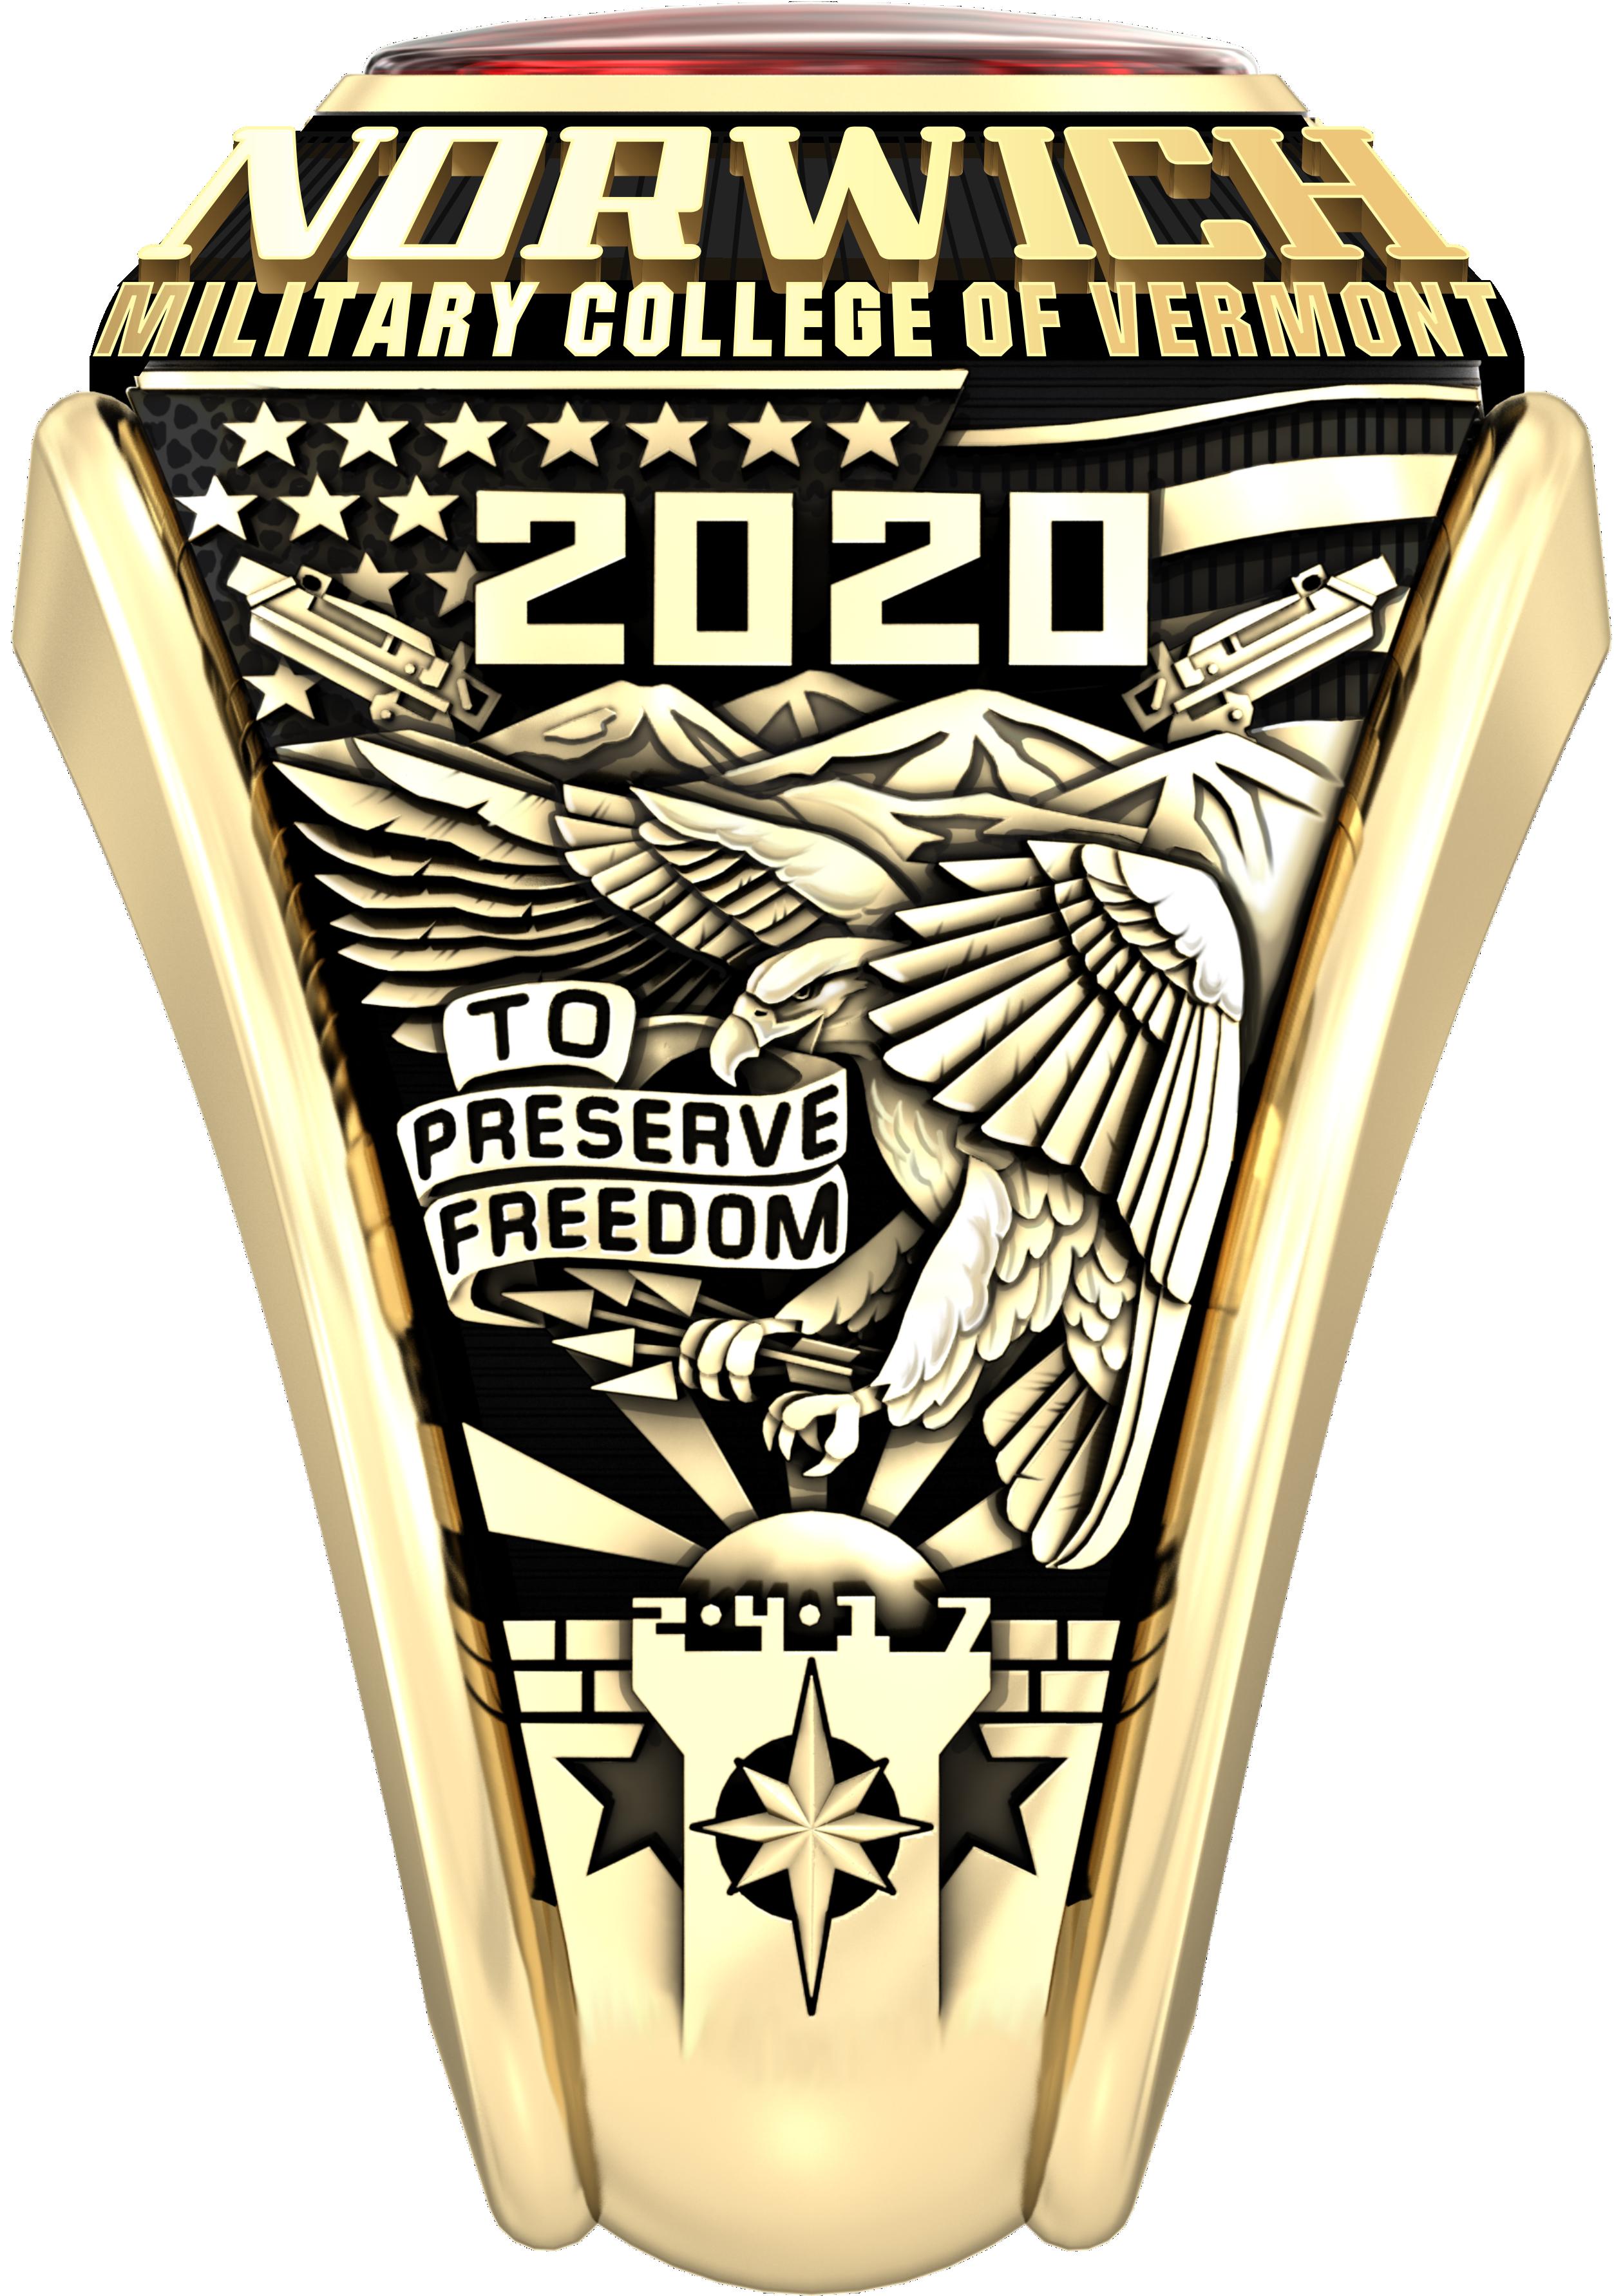 Class of 2020 Class Ring